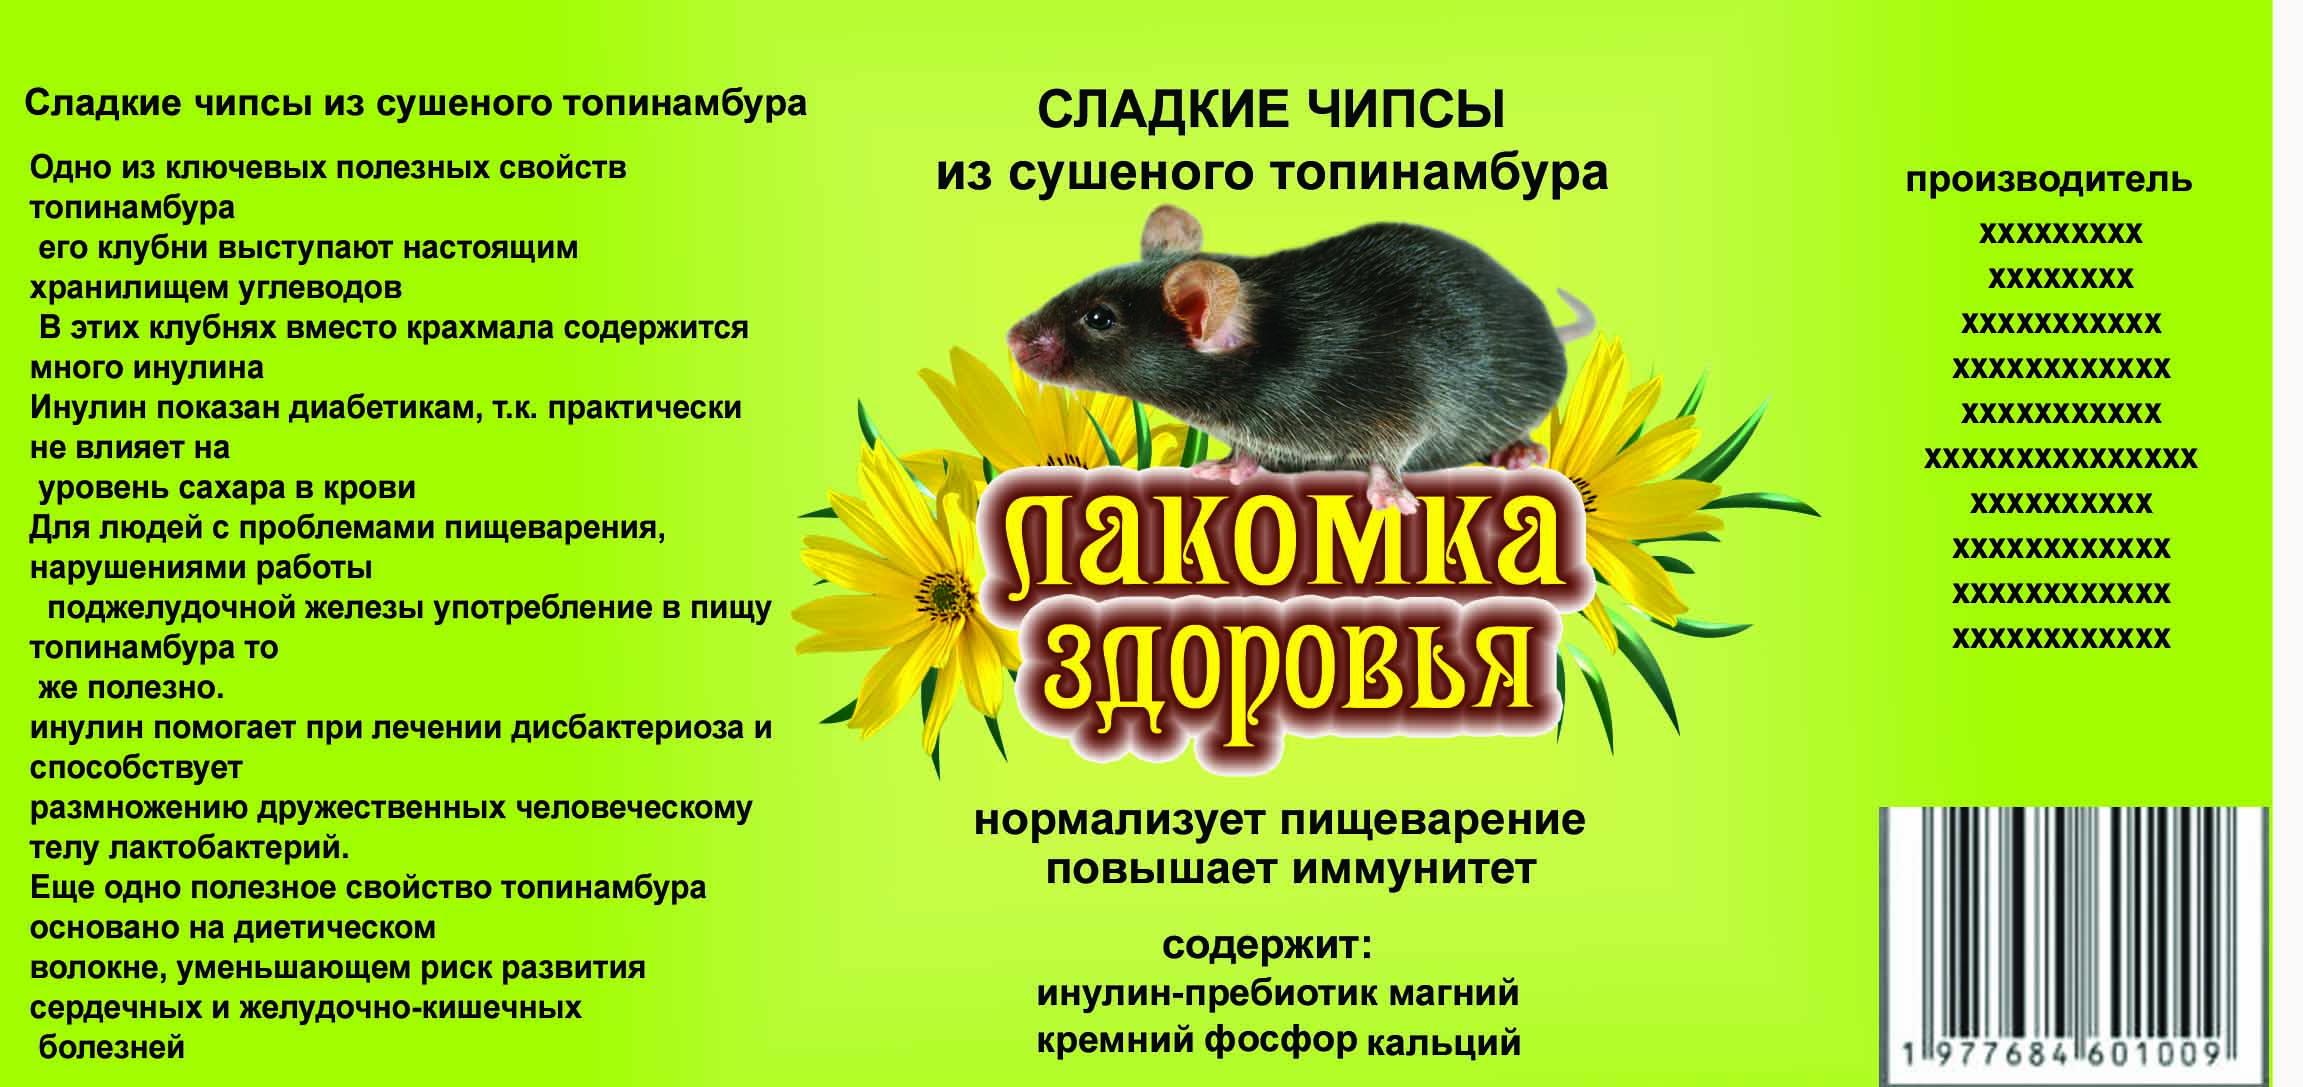 Дизайн этикетки на ПЭТ-банку лакомства для домашних грызунов фото f_84253b2dee66f8b4.jpg